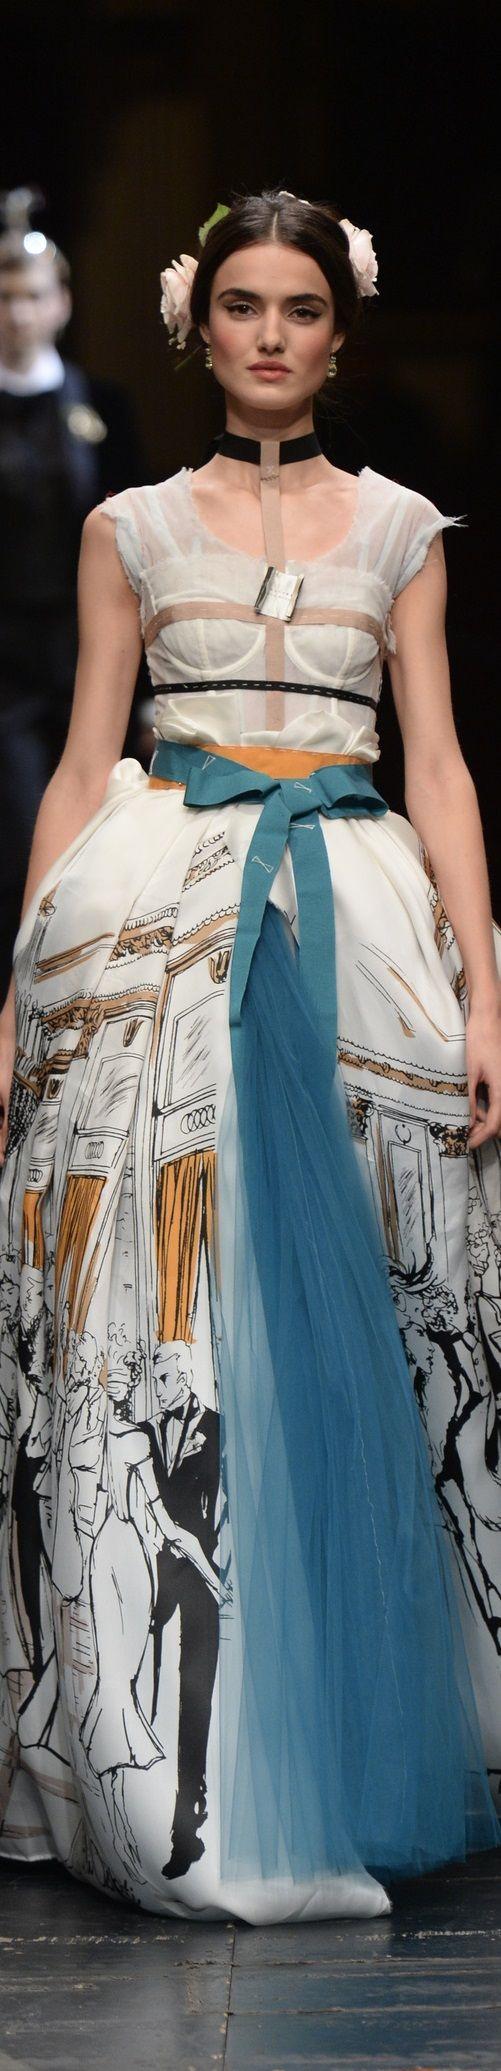 Dolce & Gabbana spring 2016 couture ... http://escort-journal.com  Escort,  эскорт Работа, девушка, рубеж, австралия, турция, сша, америка, граница Поможем оформить визу в Австралию. Заработок: Австралия  от $ 20000 и выше. Америка  +США от $ 10000, Норвегия, Италия, Греция, Турция от $ 3000